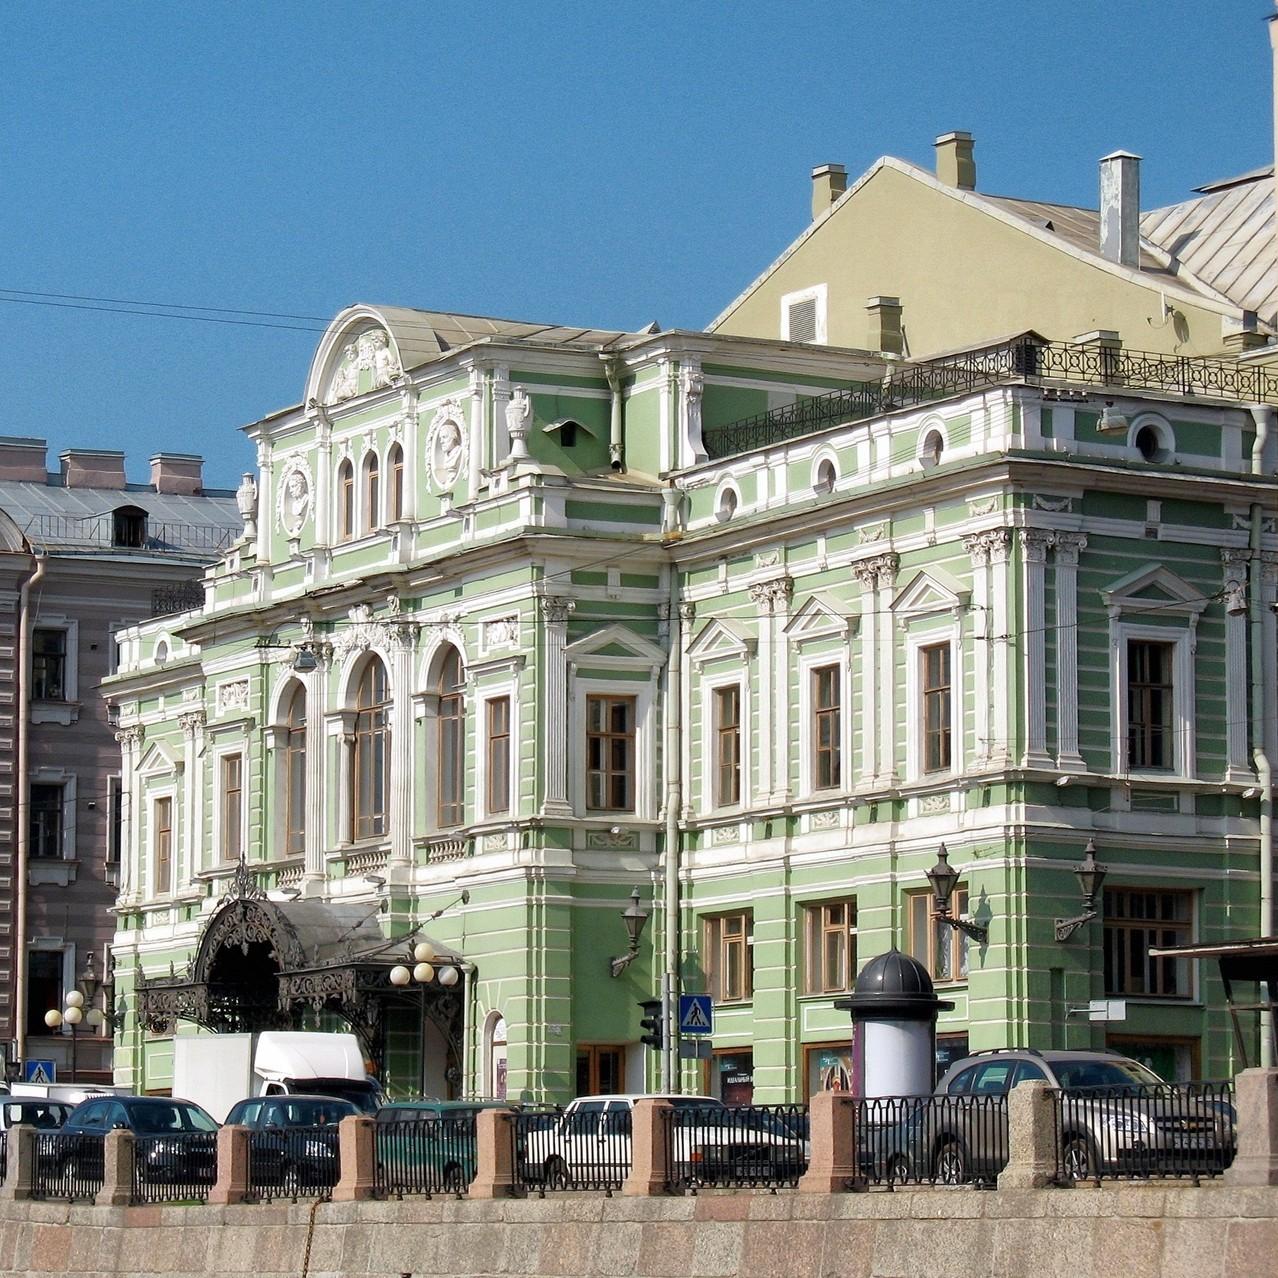 Saint_Petersburg_Tovstonogov_Bolshoi_Drama_Theater_IMG_6406_1280